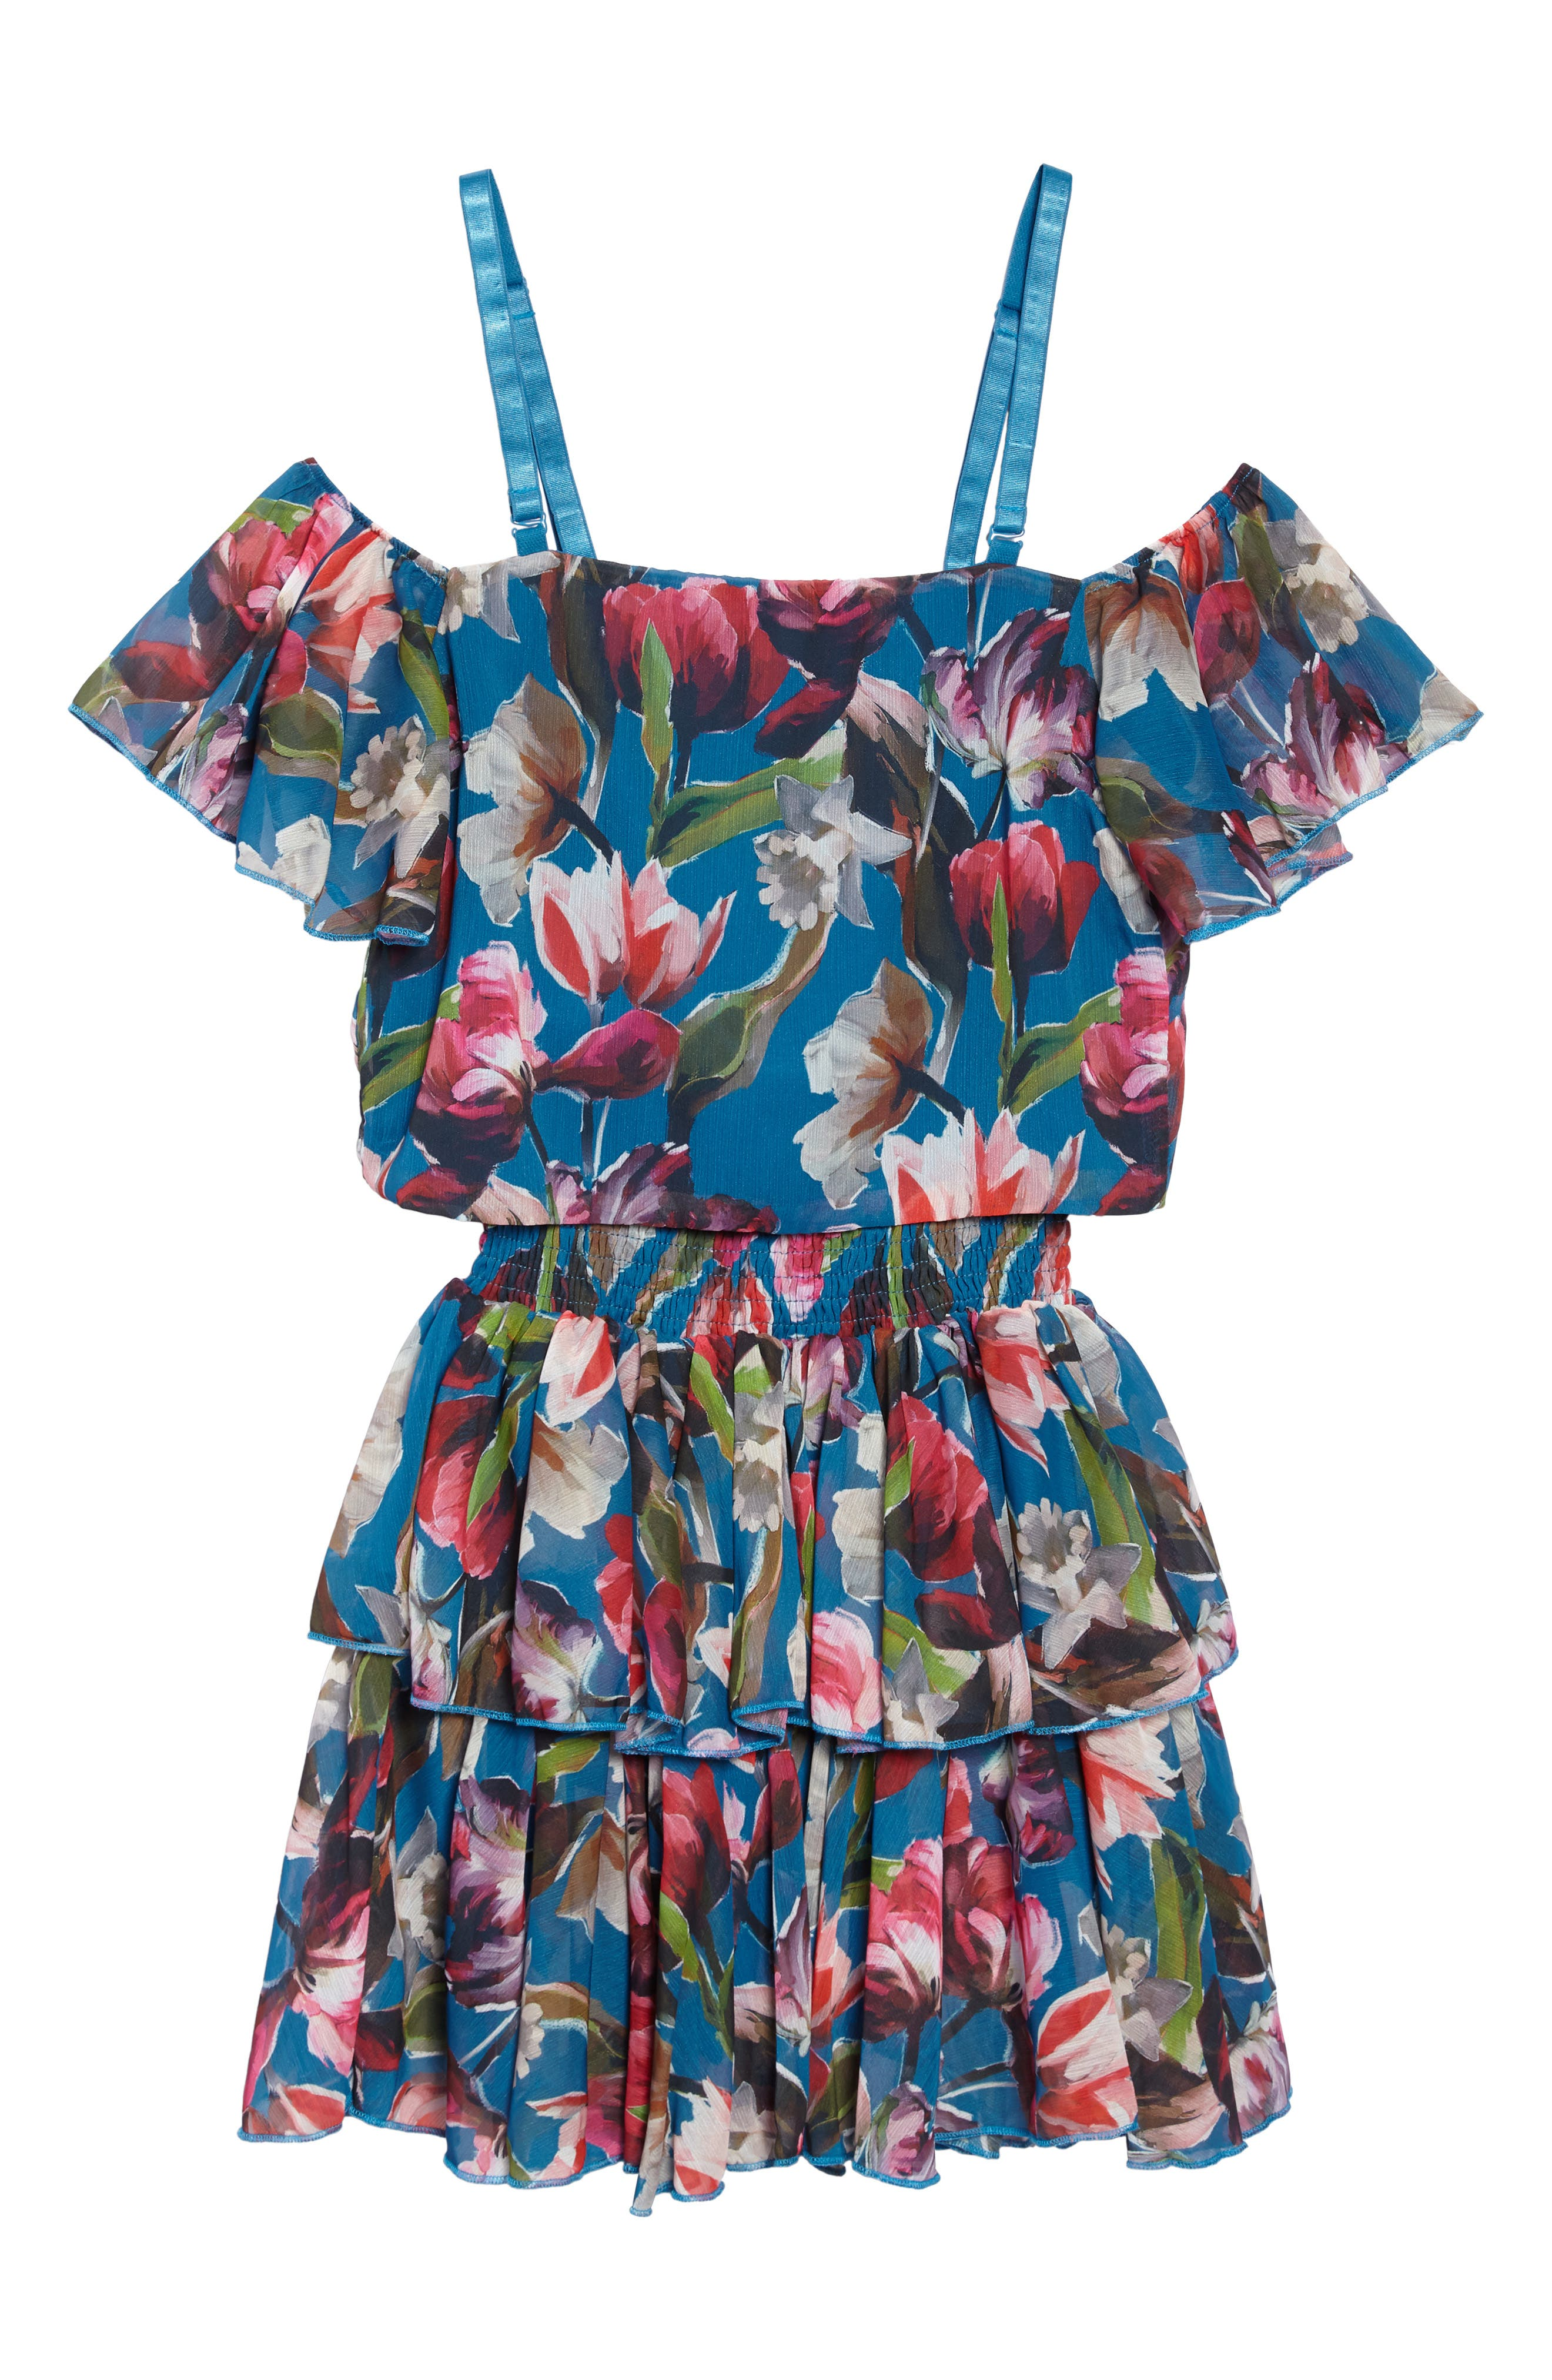 Josephine Two-Piece Ruffle Dress,                             Main thumbnail 1, color,                             Teal